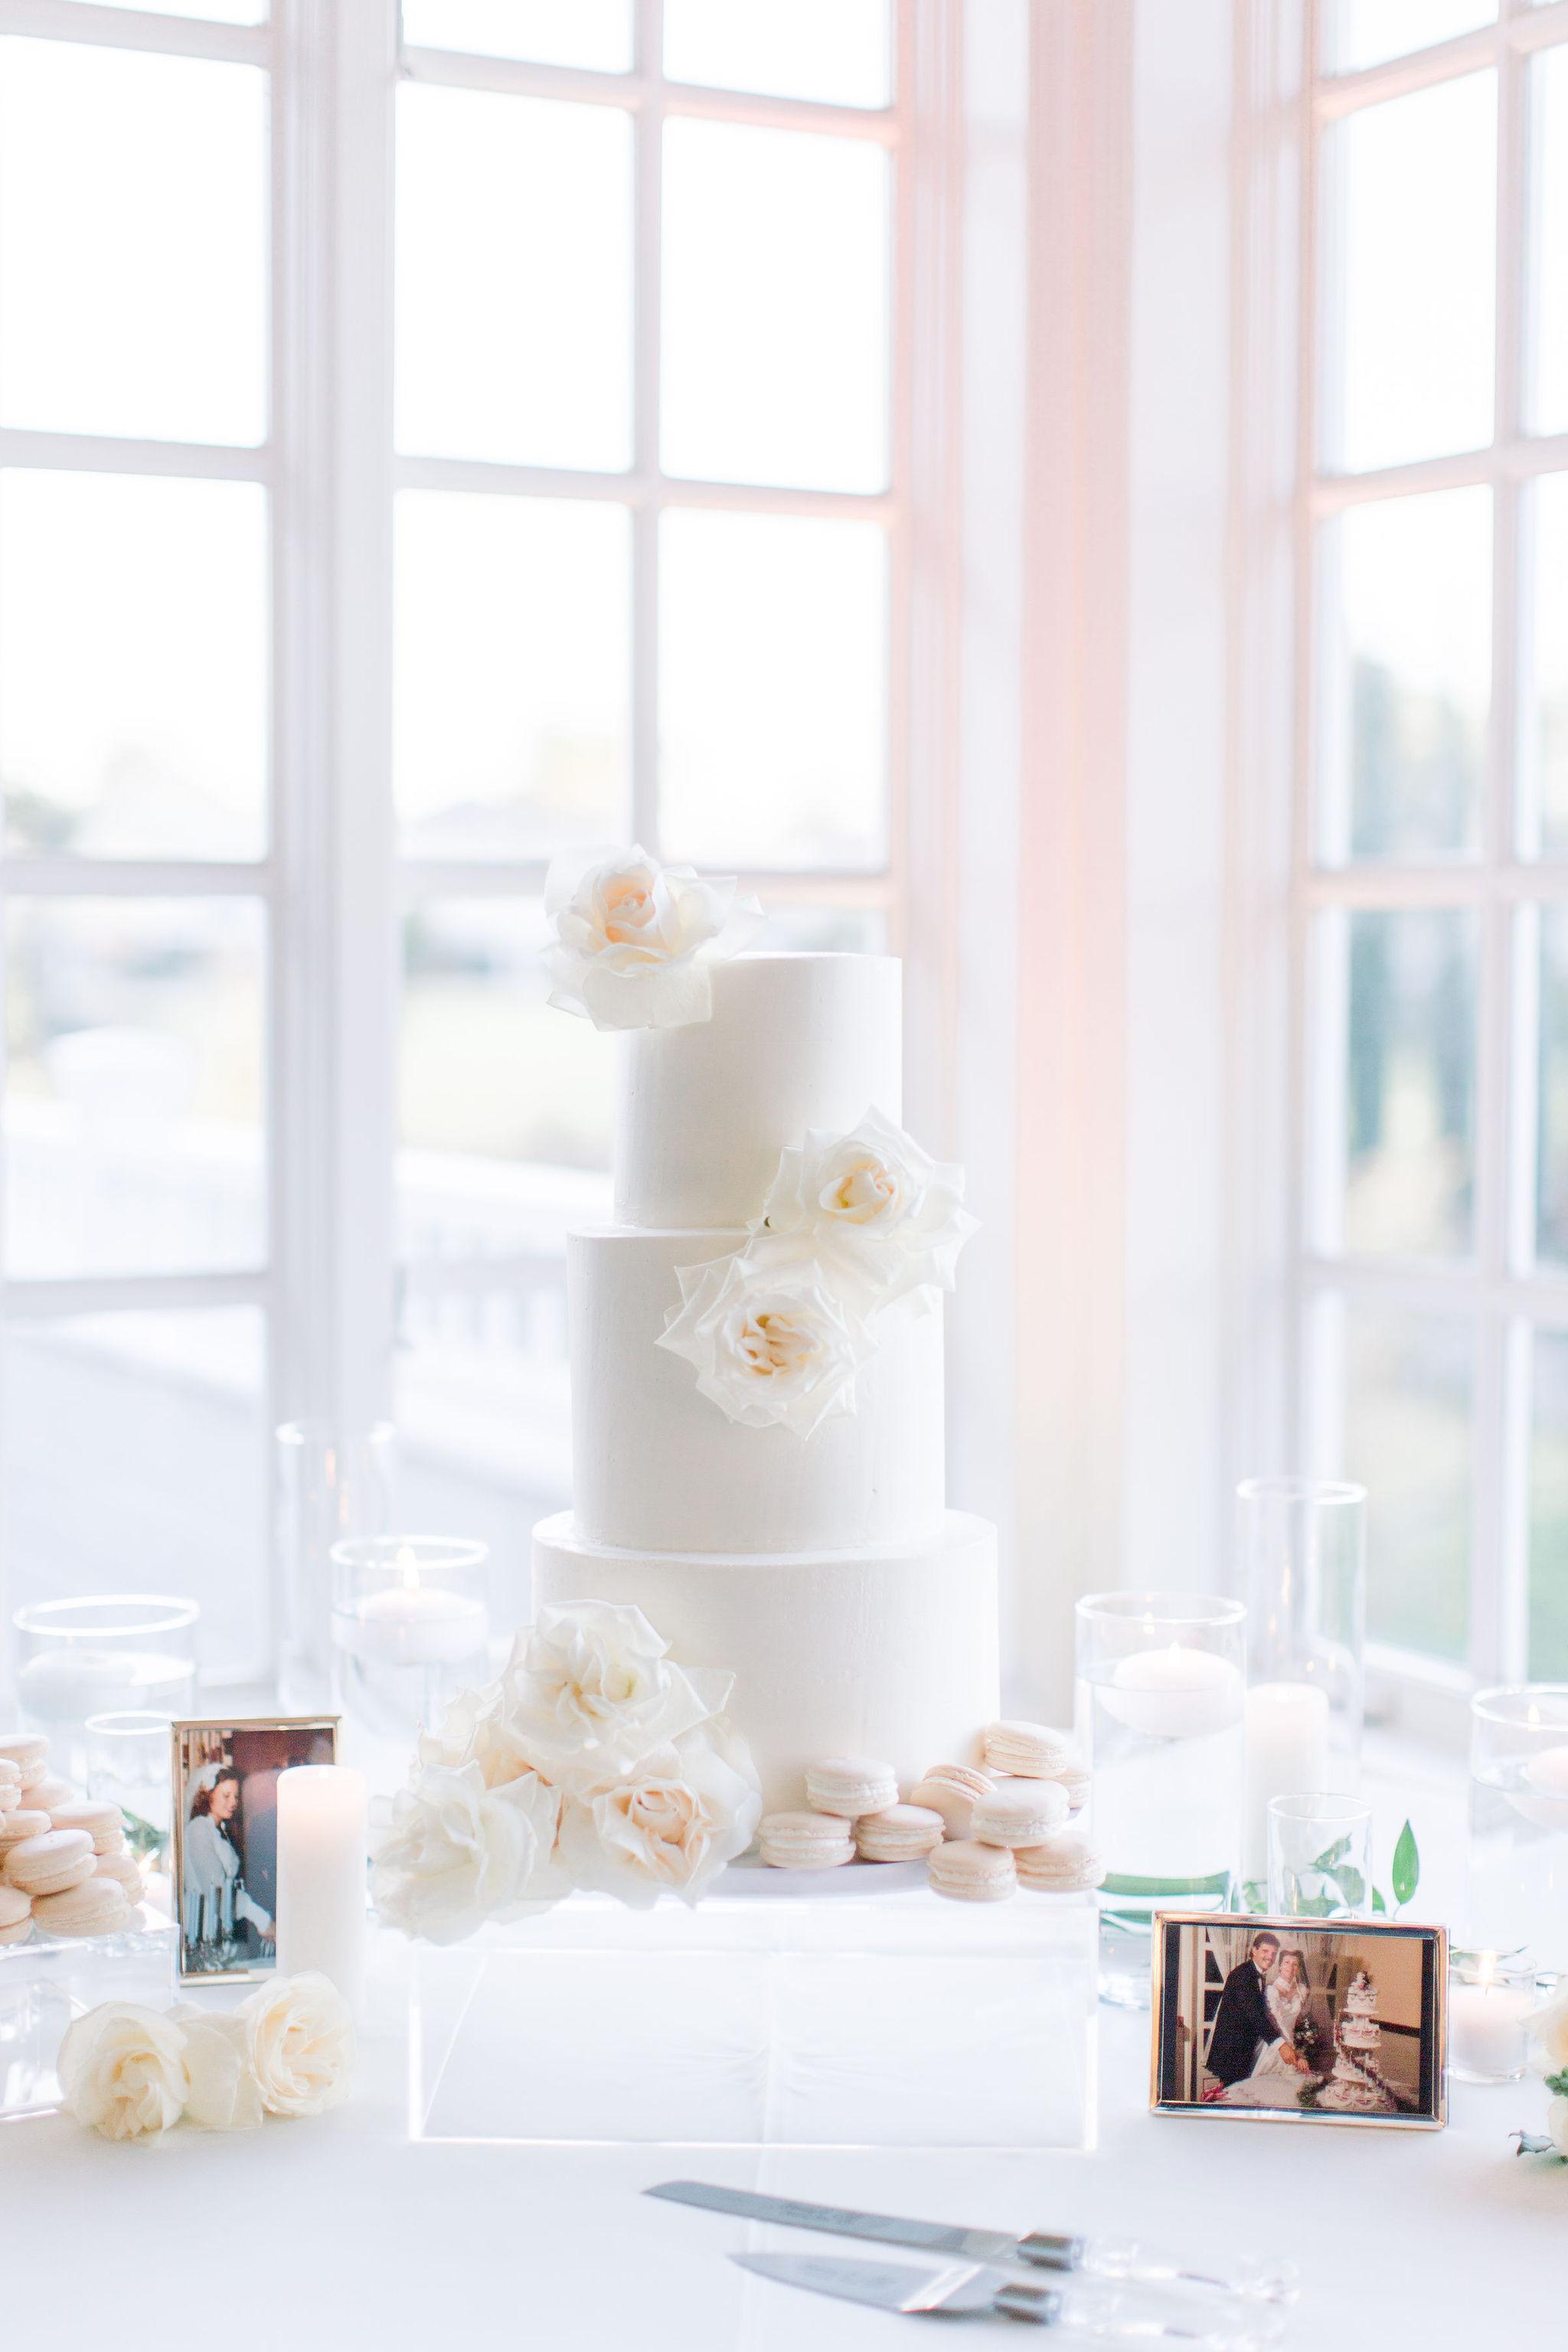 sydney-bodi-wedding-budget-friendly-blooms-carmel-mountain-white-flowers-10.jpg